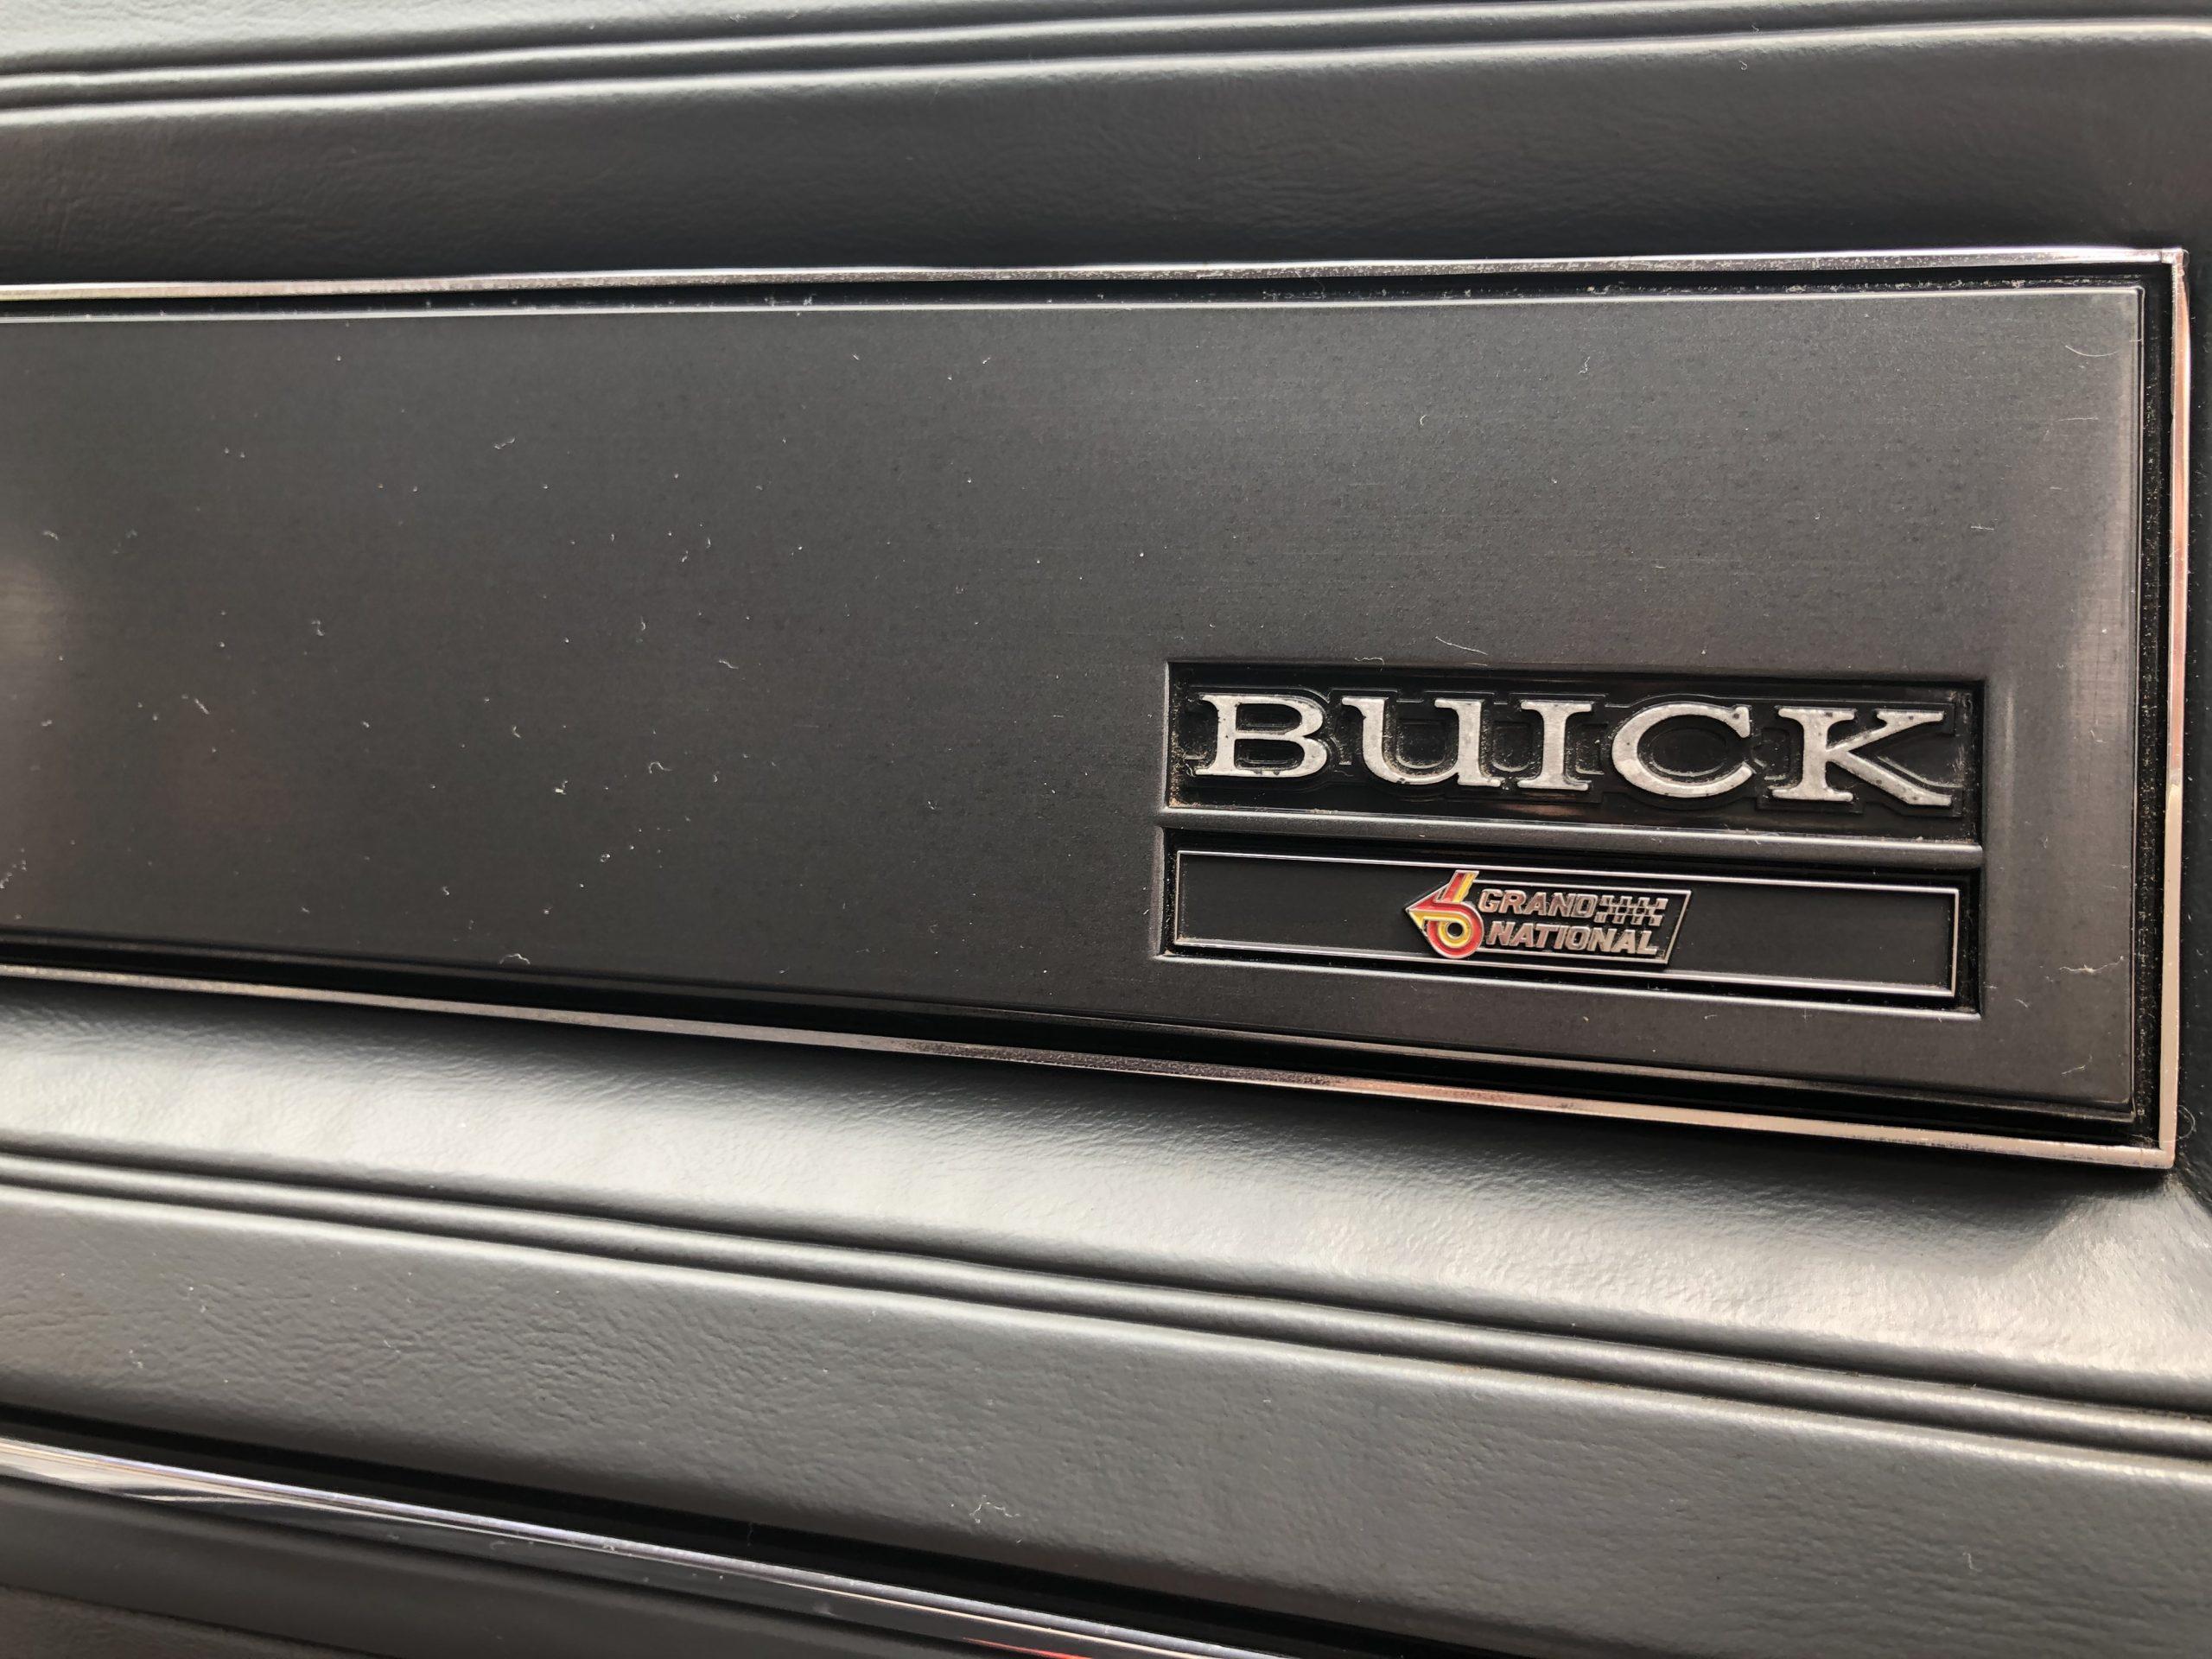 1987 Buick Grand National interior dash